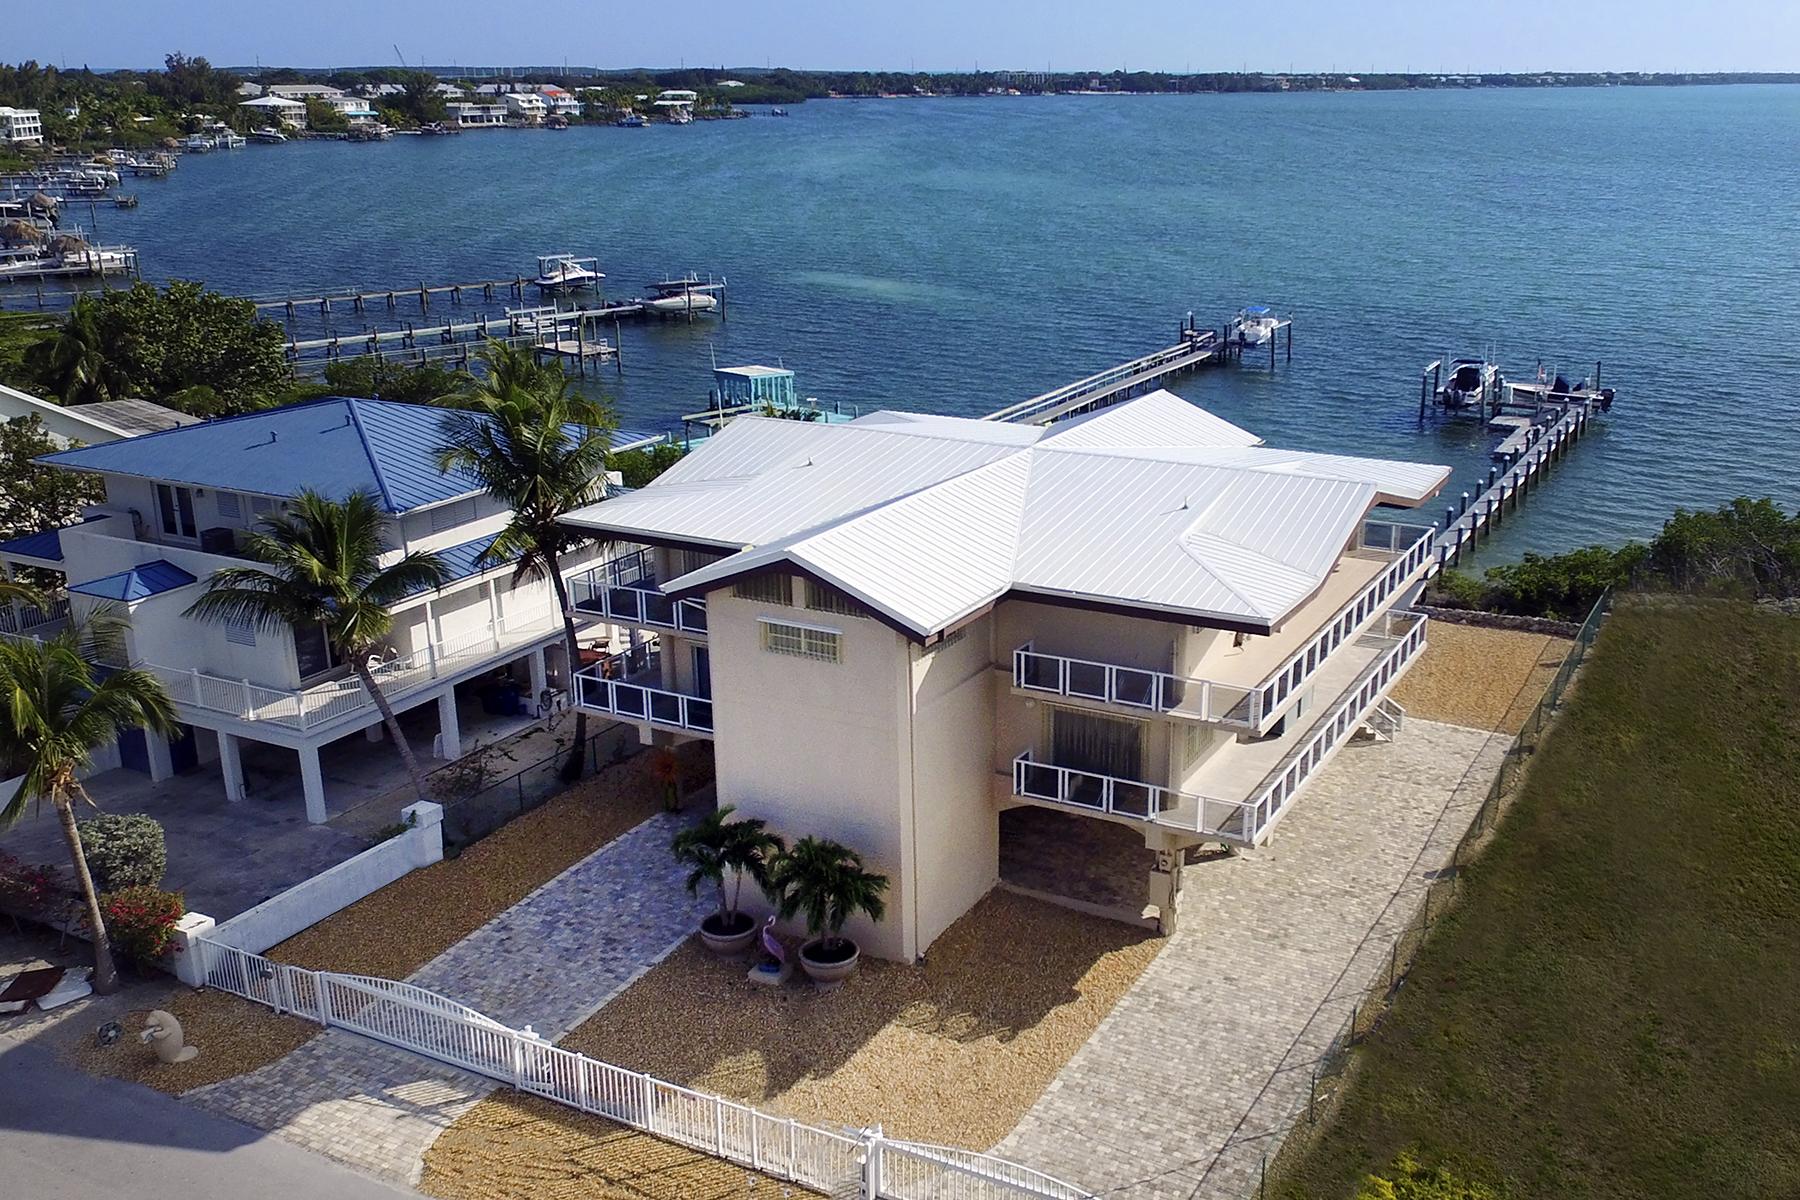 Single Family Home for Sale at Bayfront Pool Home 41 N Bounty Lane Key Largo, Florida, 33037 United States